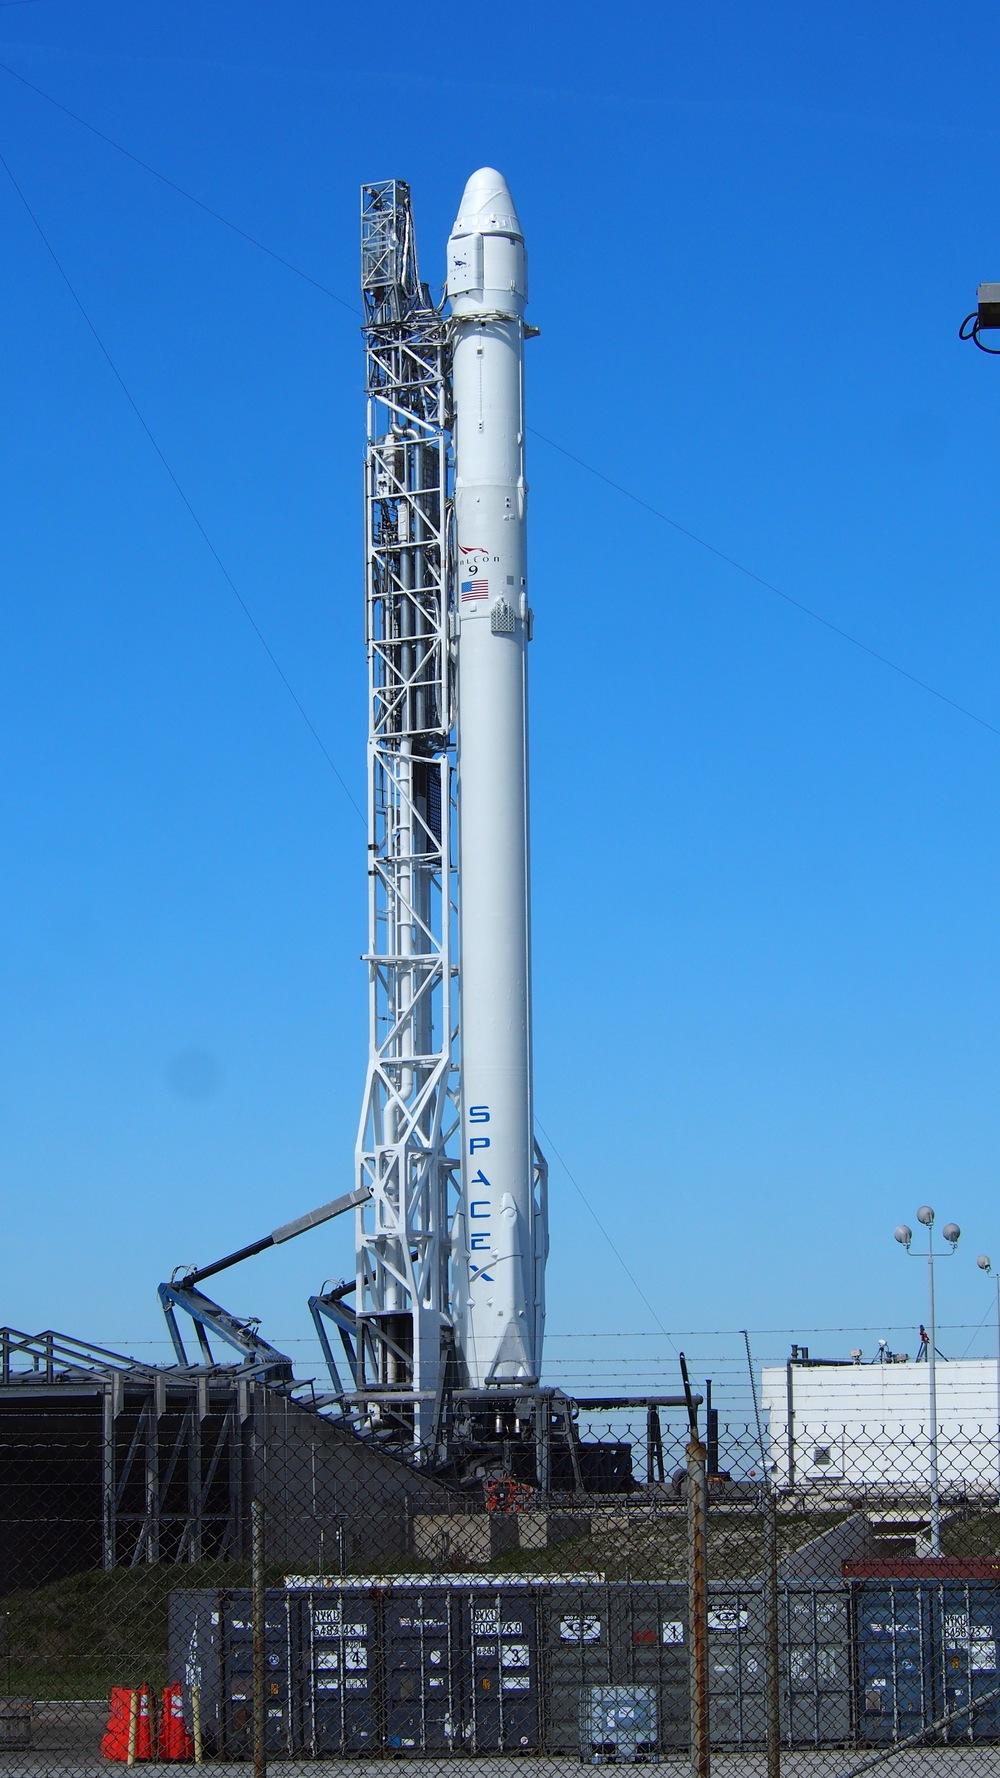 Falcon 9 at SLC-40